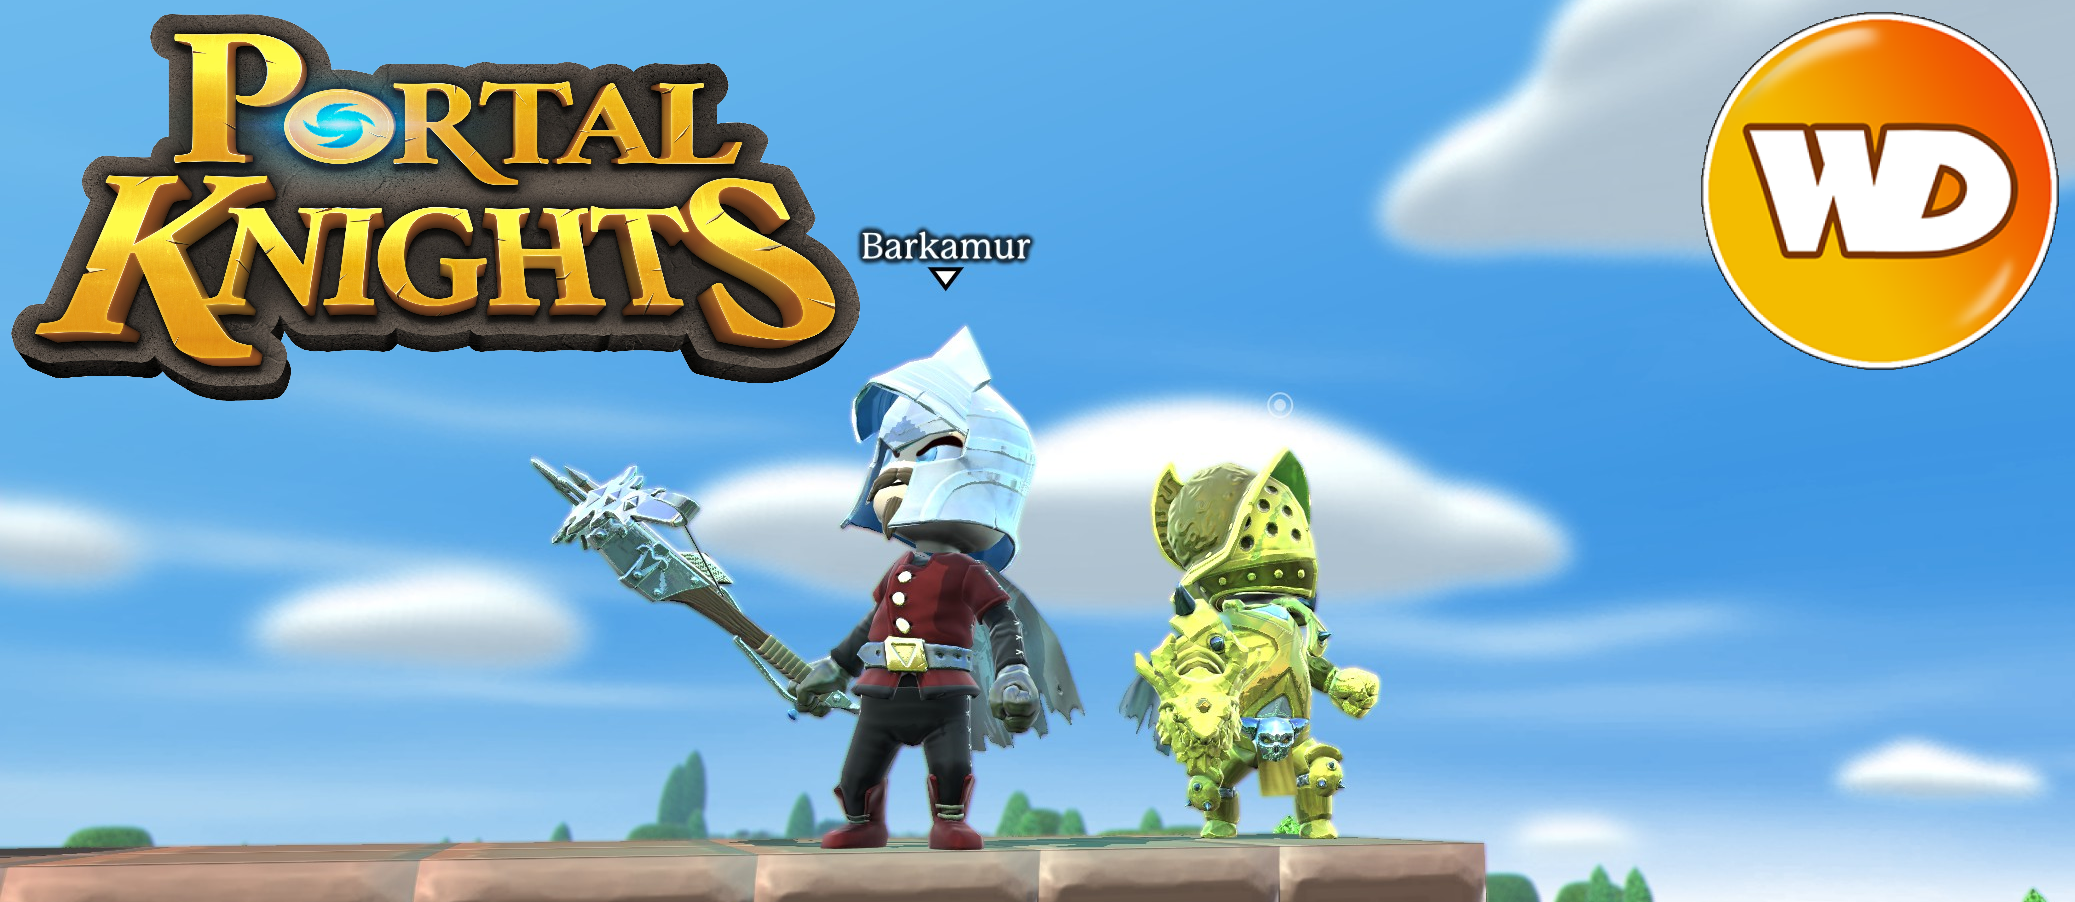 Portal Knights - épisode bonus 1